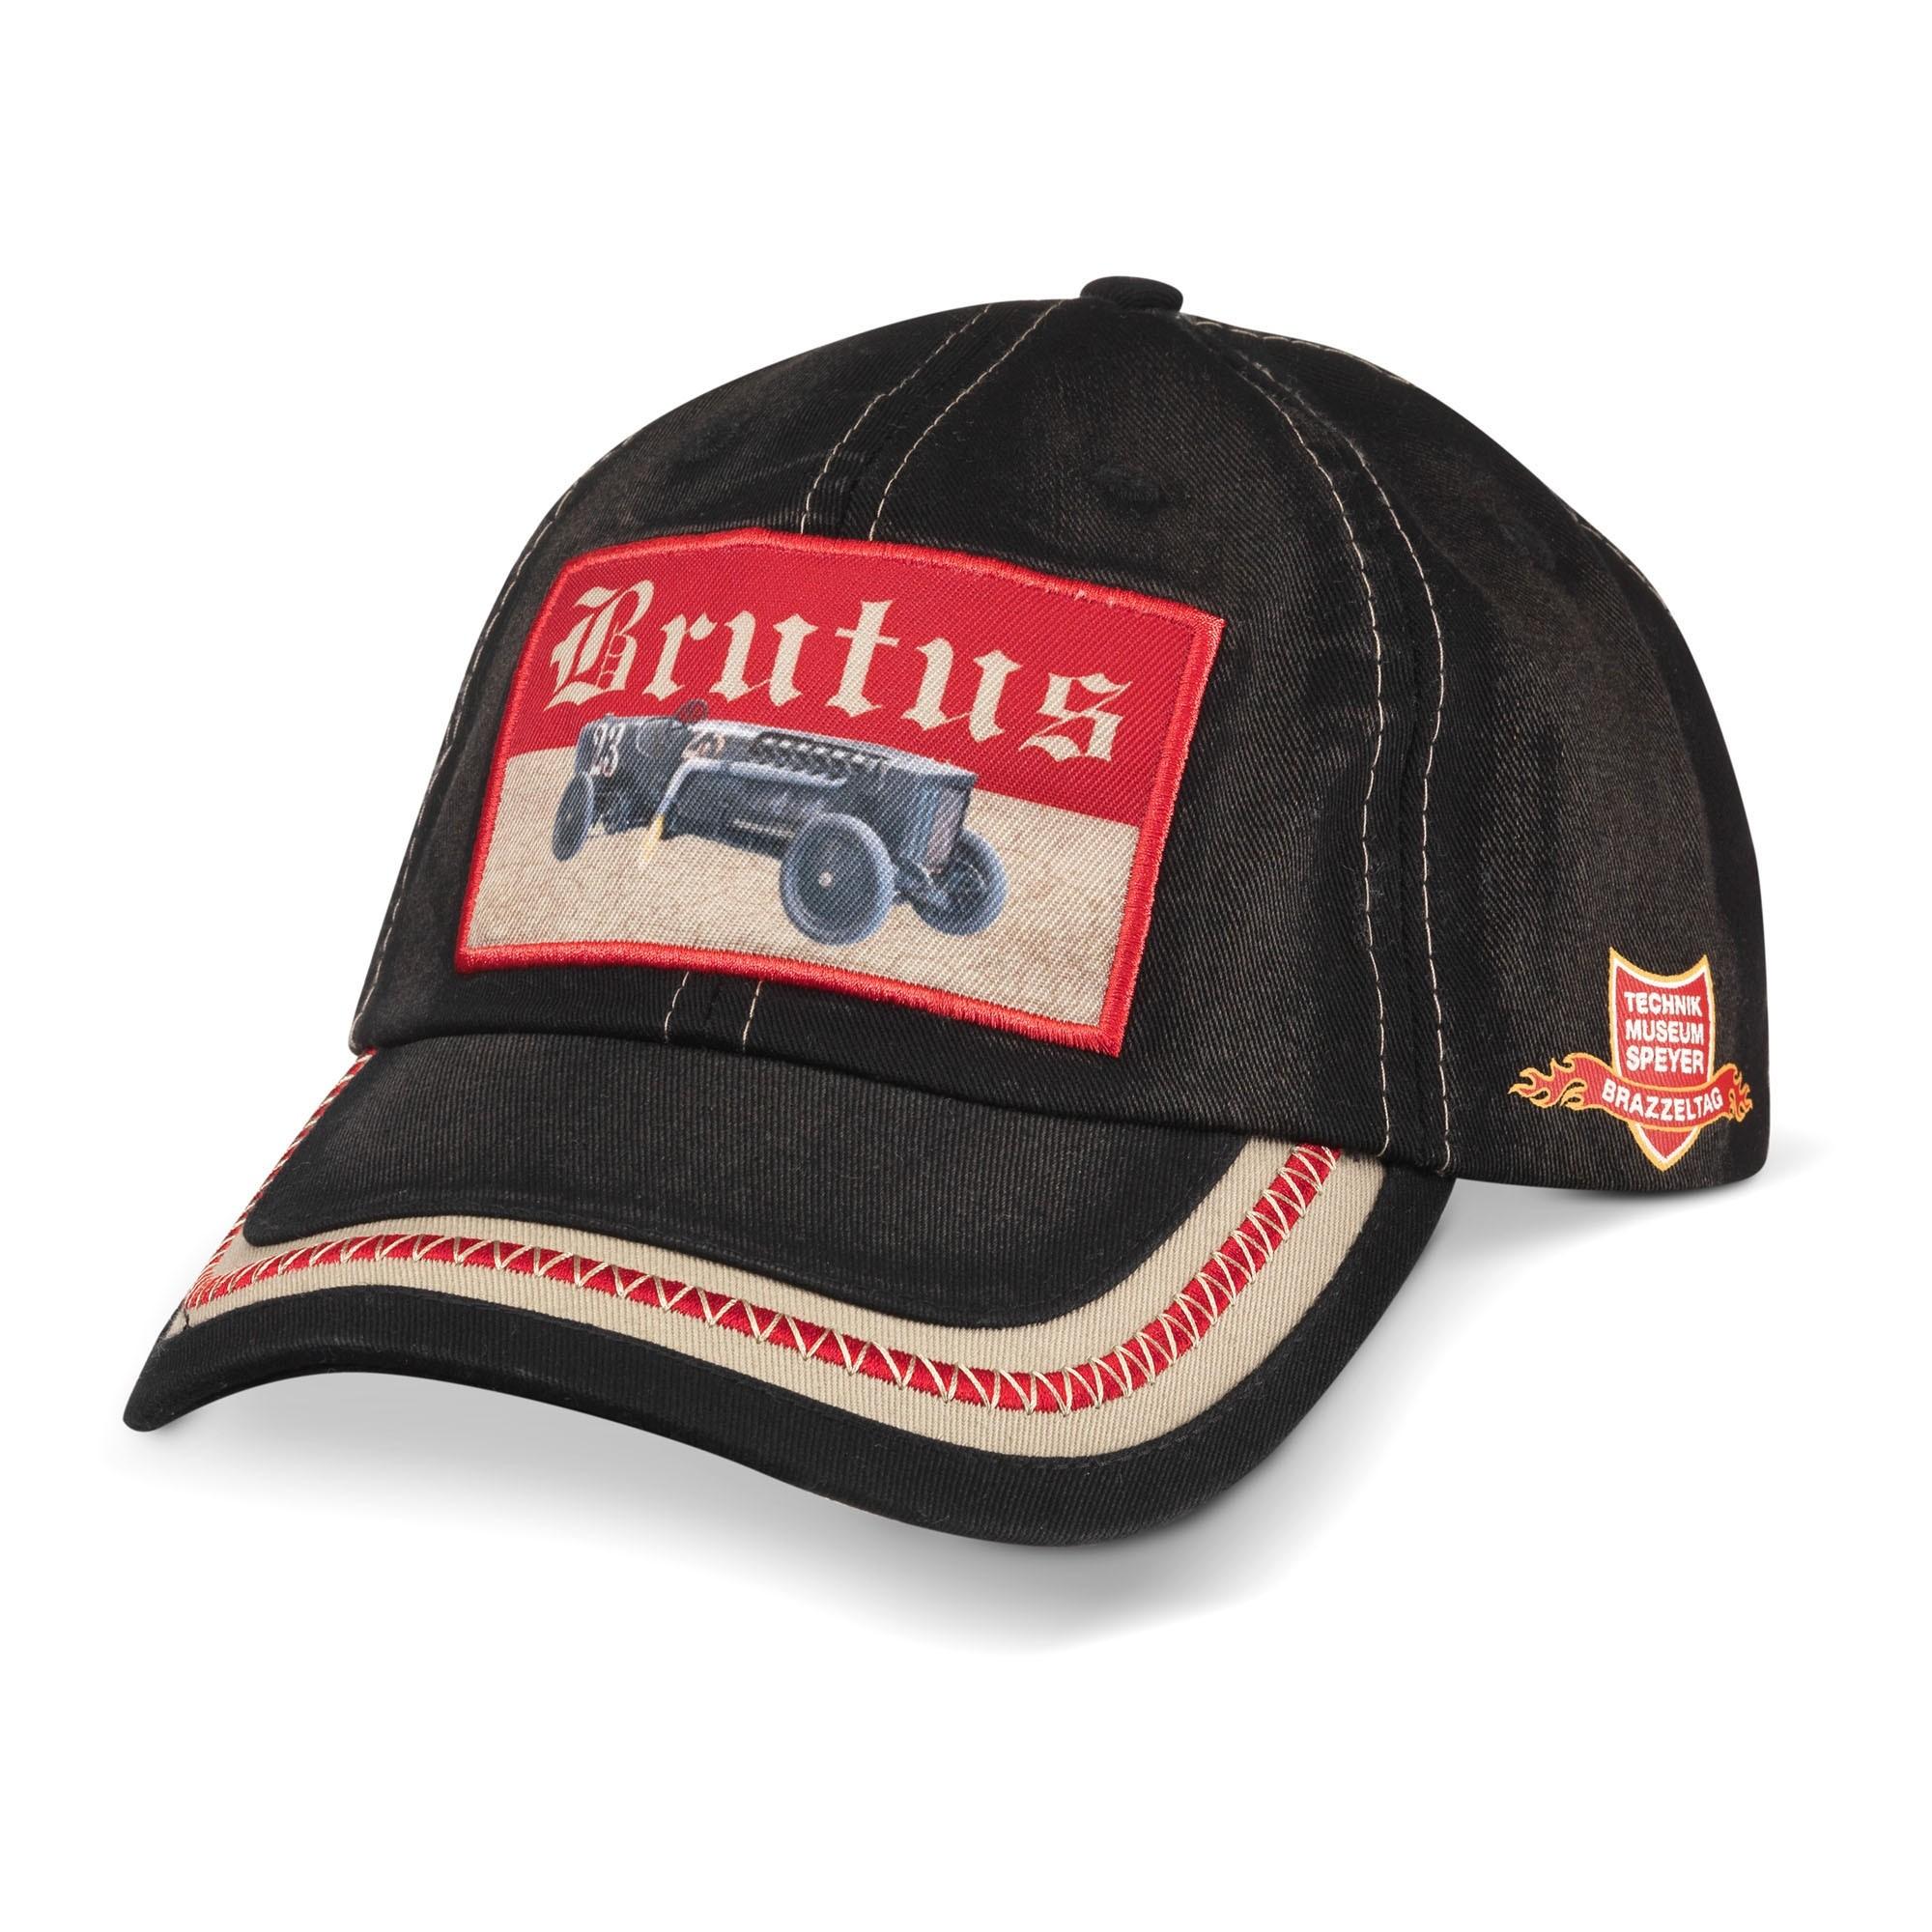 Brazzeltag / Brutus Base Cap